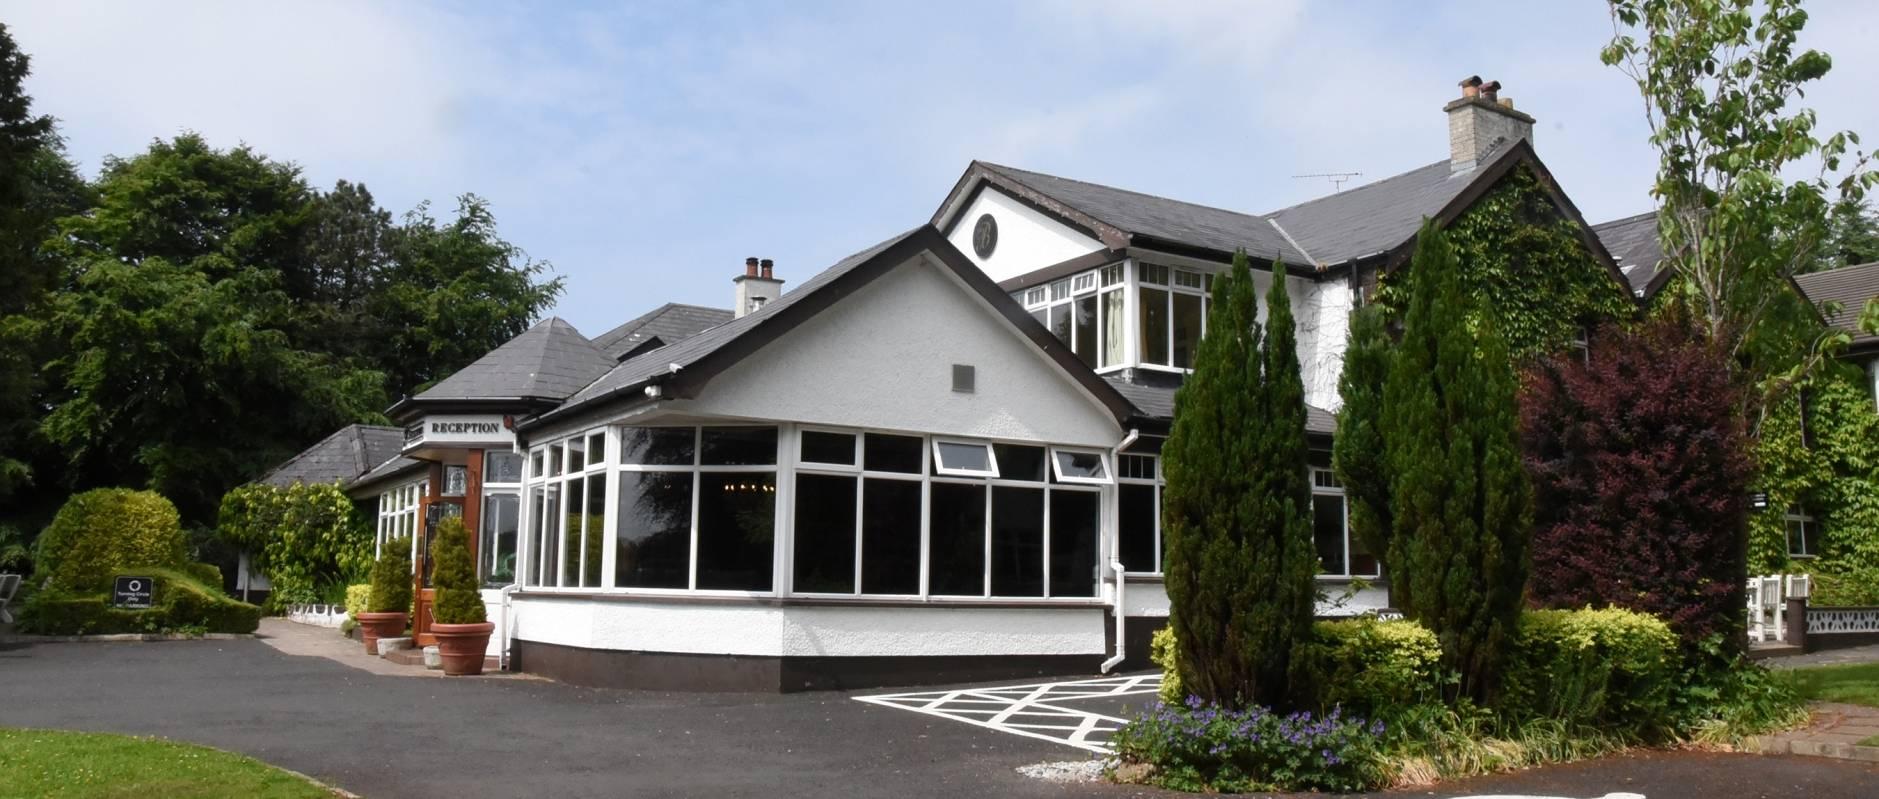 accommodation Bushtown Hotel Coleraine Londonderry